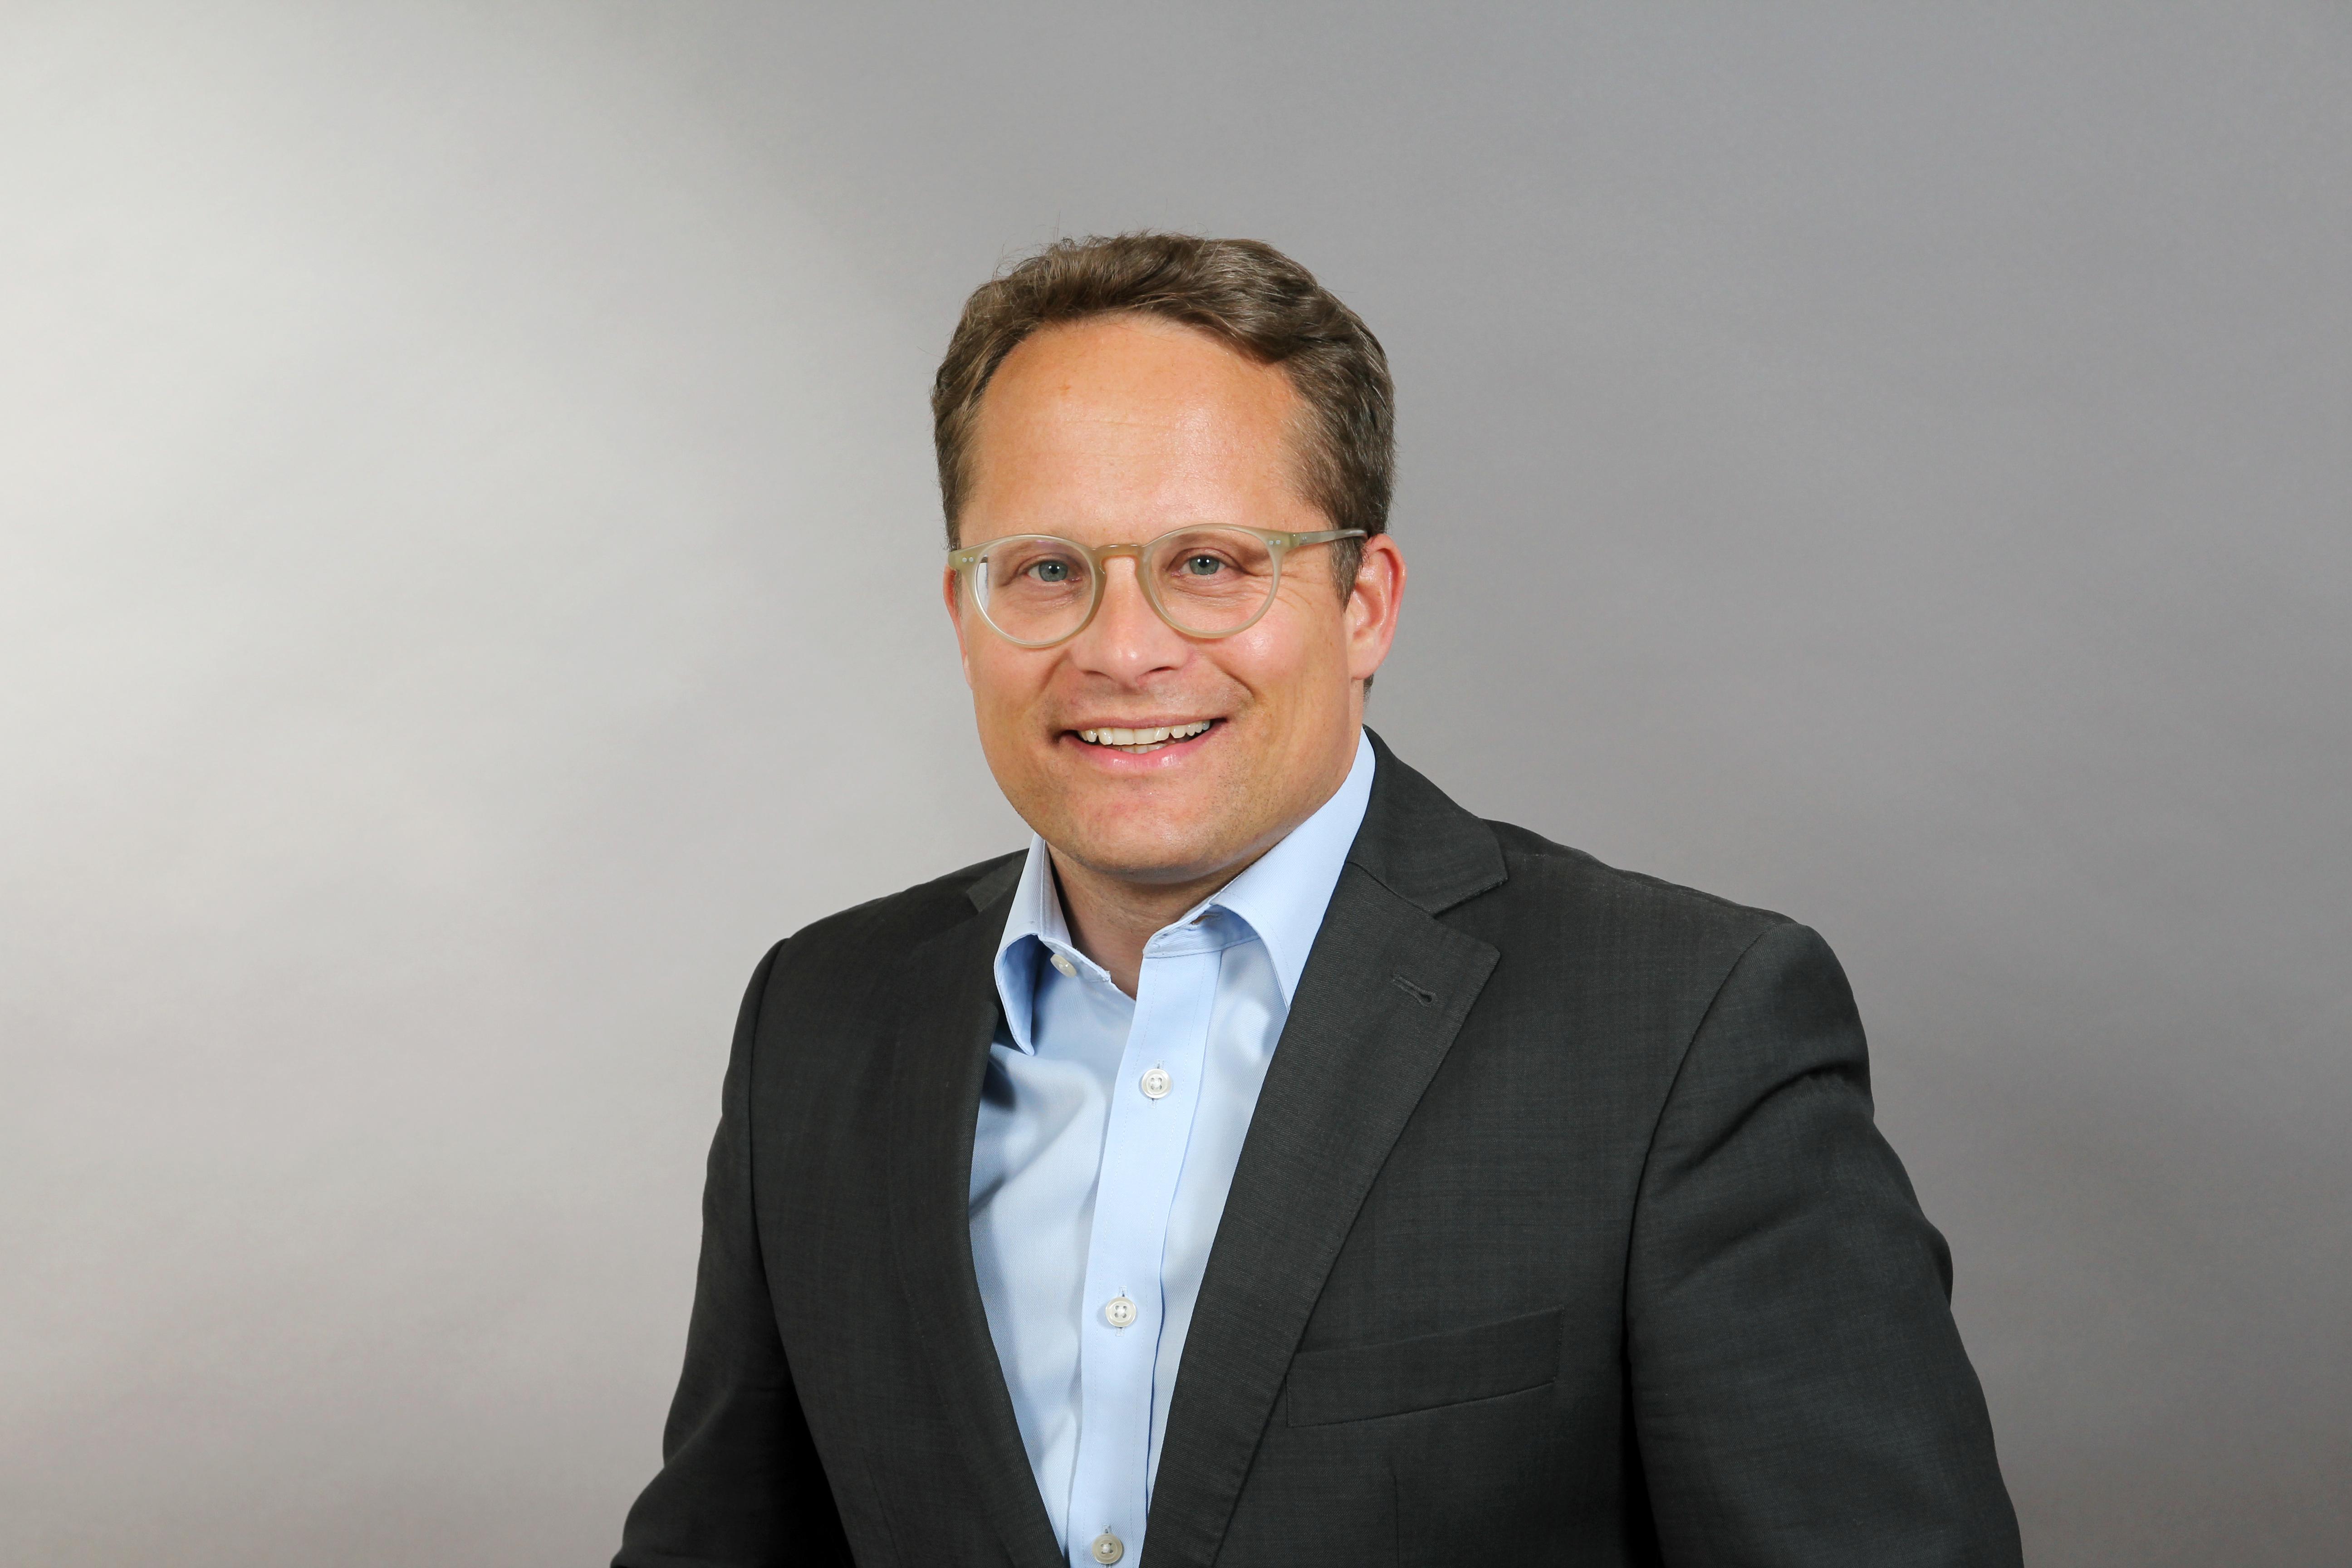 Christoph Stresing